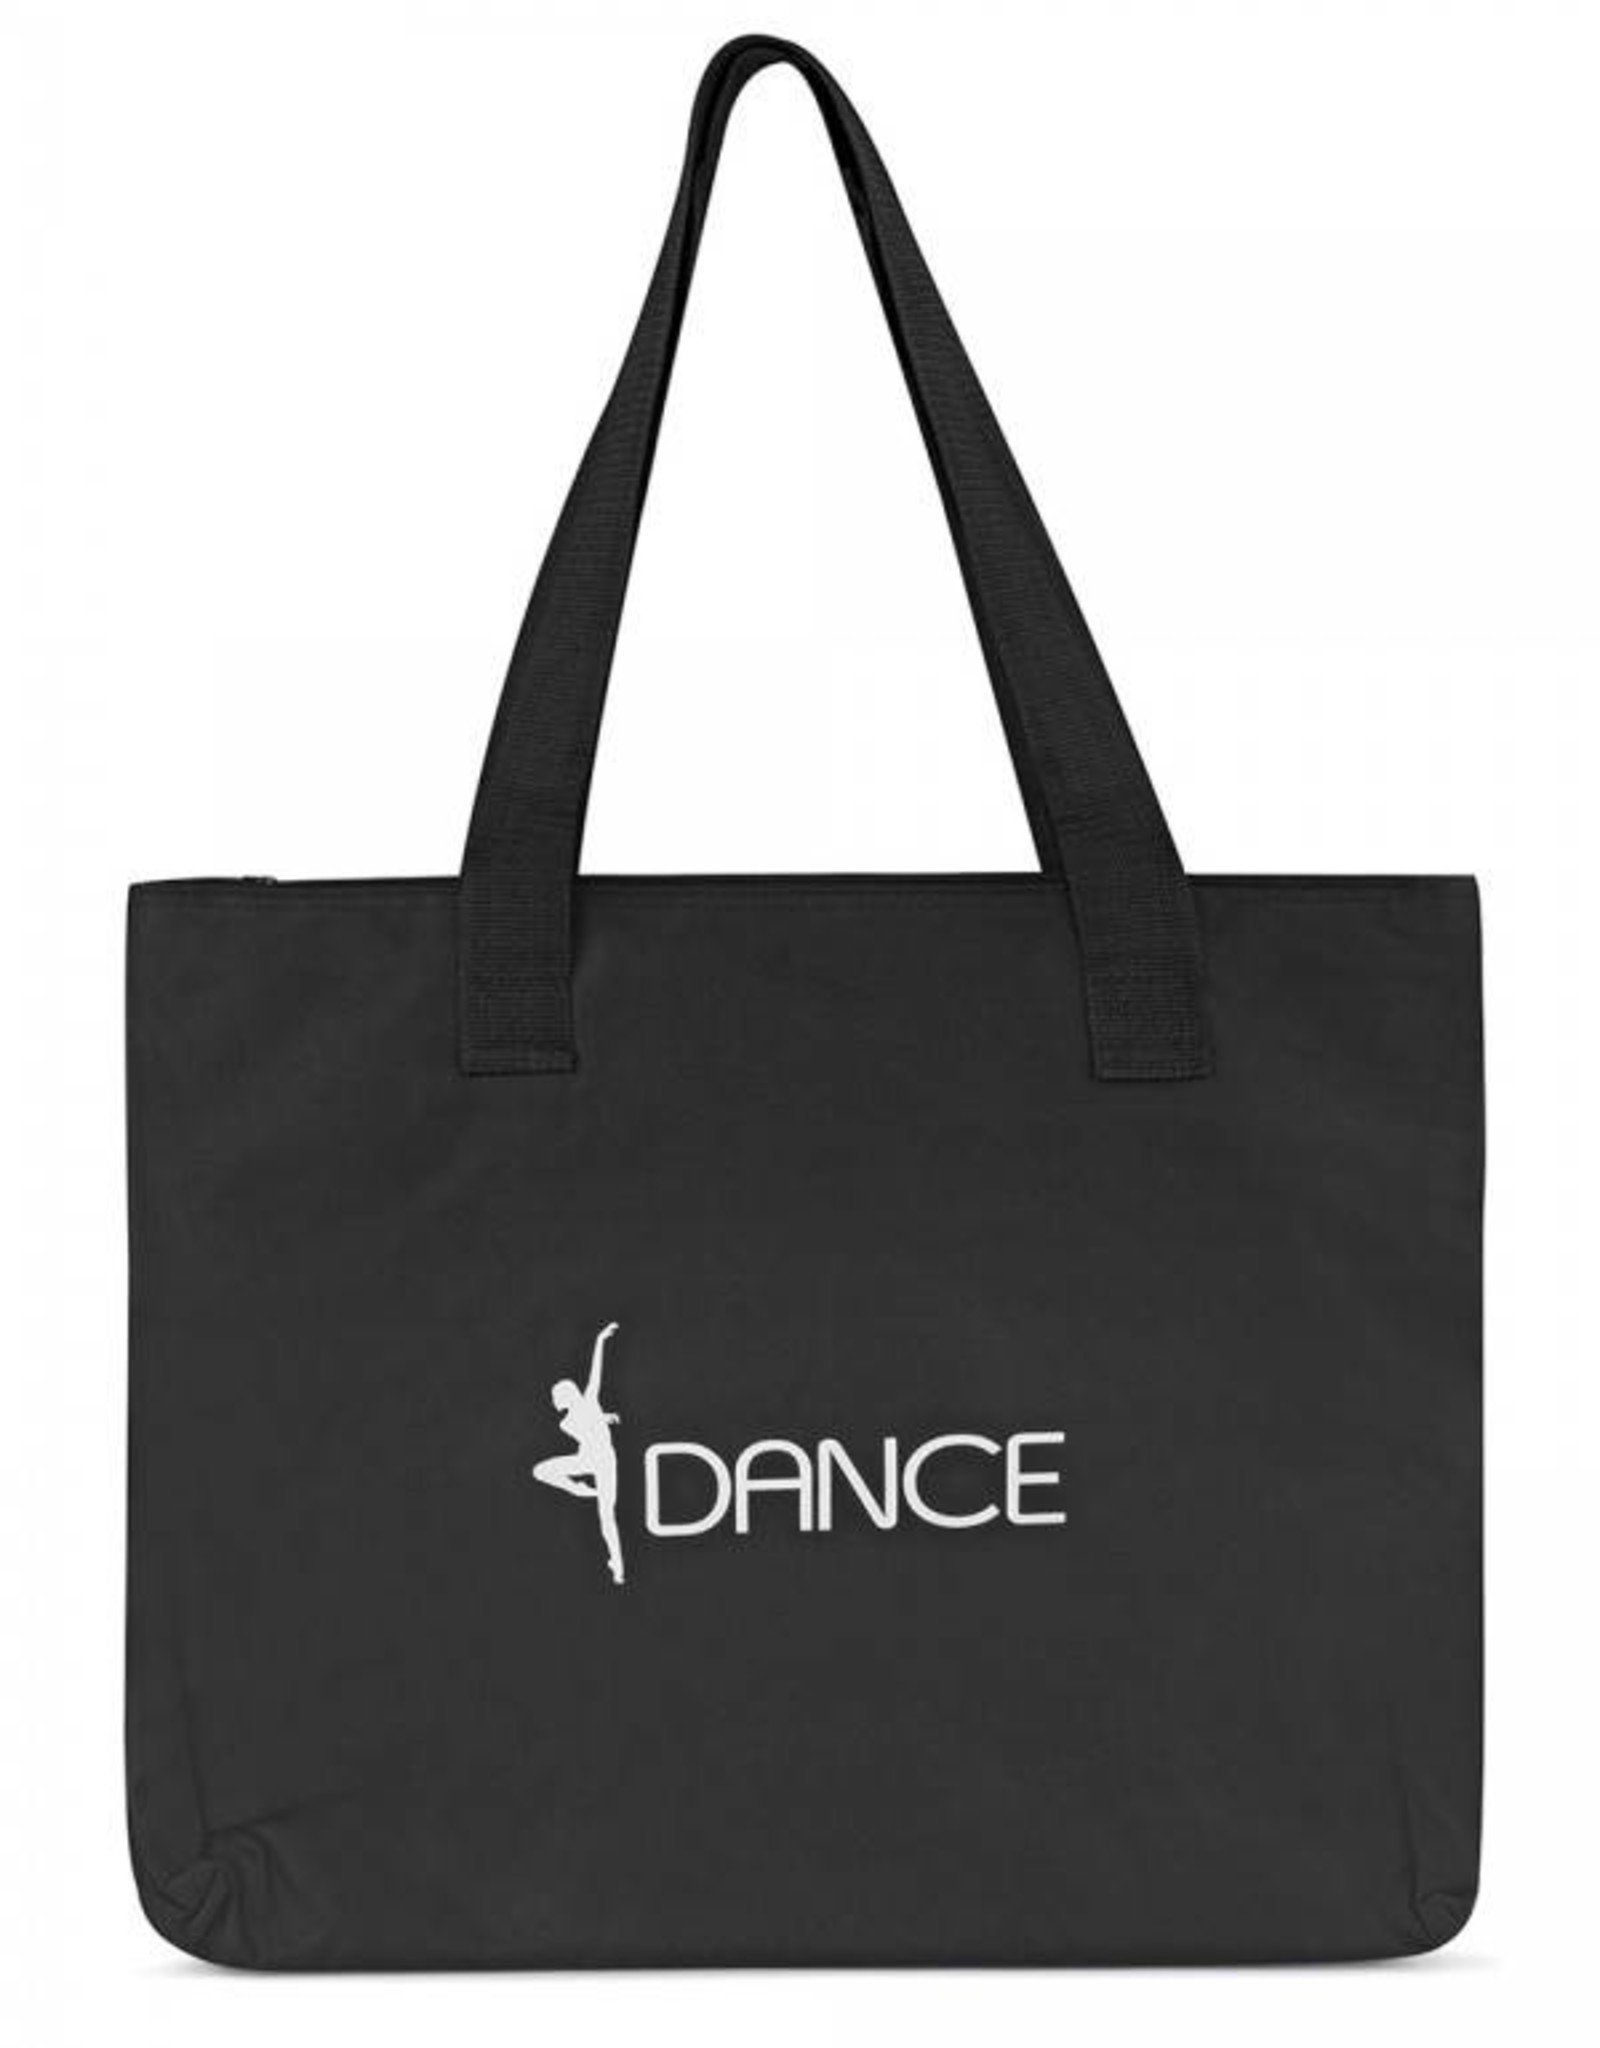 Bloch A301 Ladies Dance Tote Bag